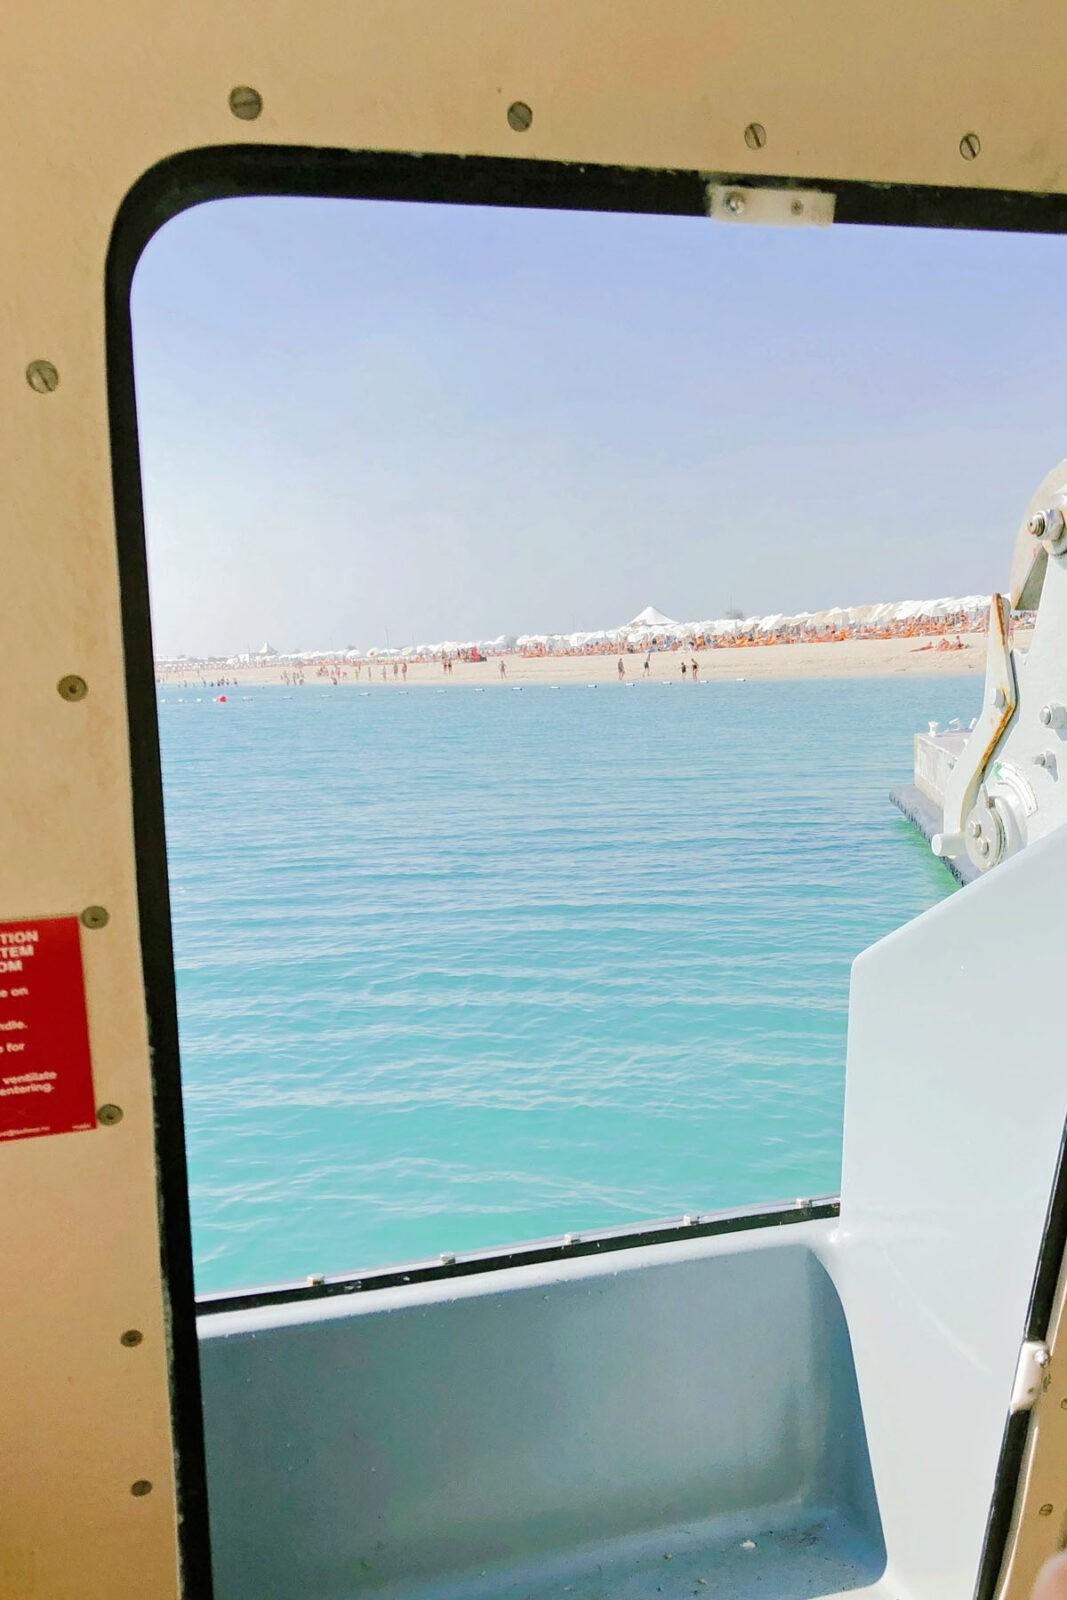 Kreuzfahrt: Landausflug auf Sir Bani Yas